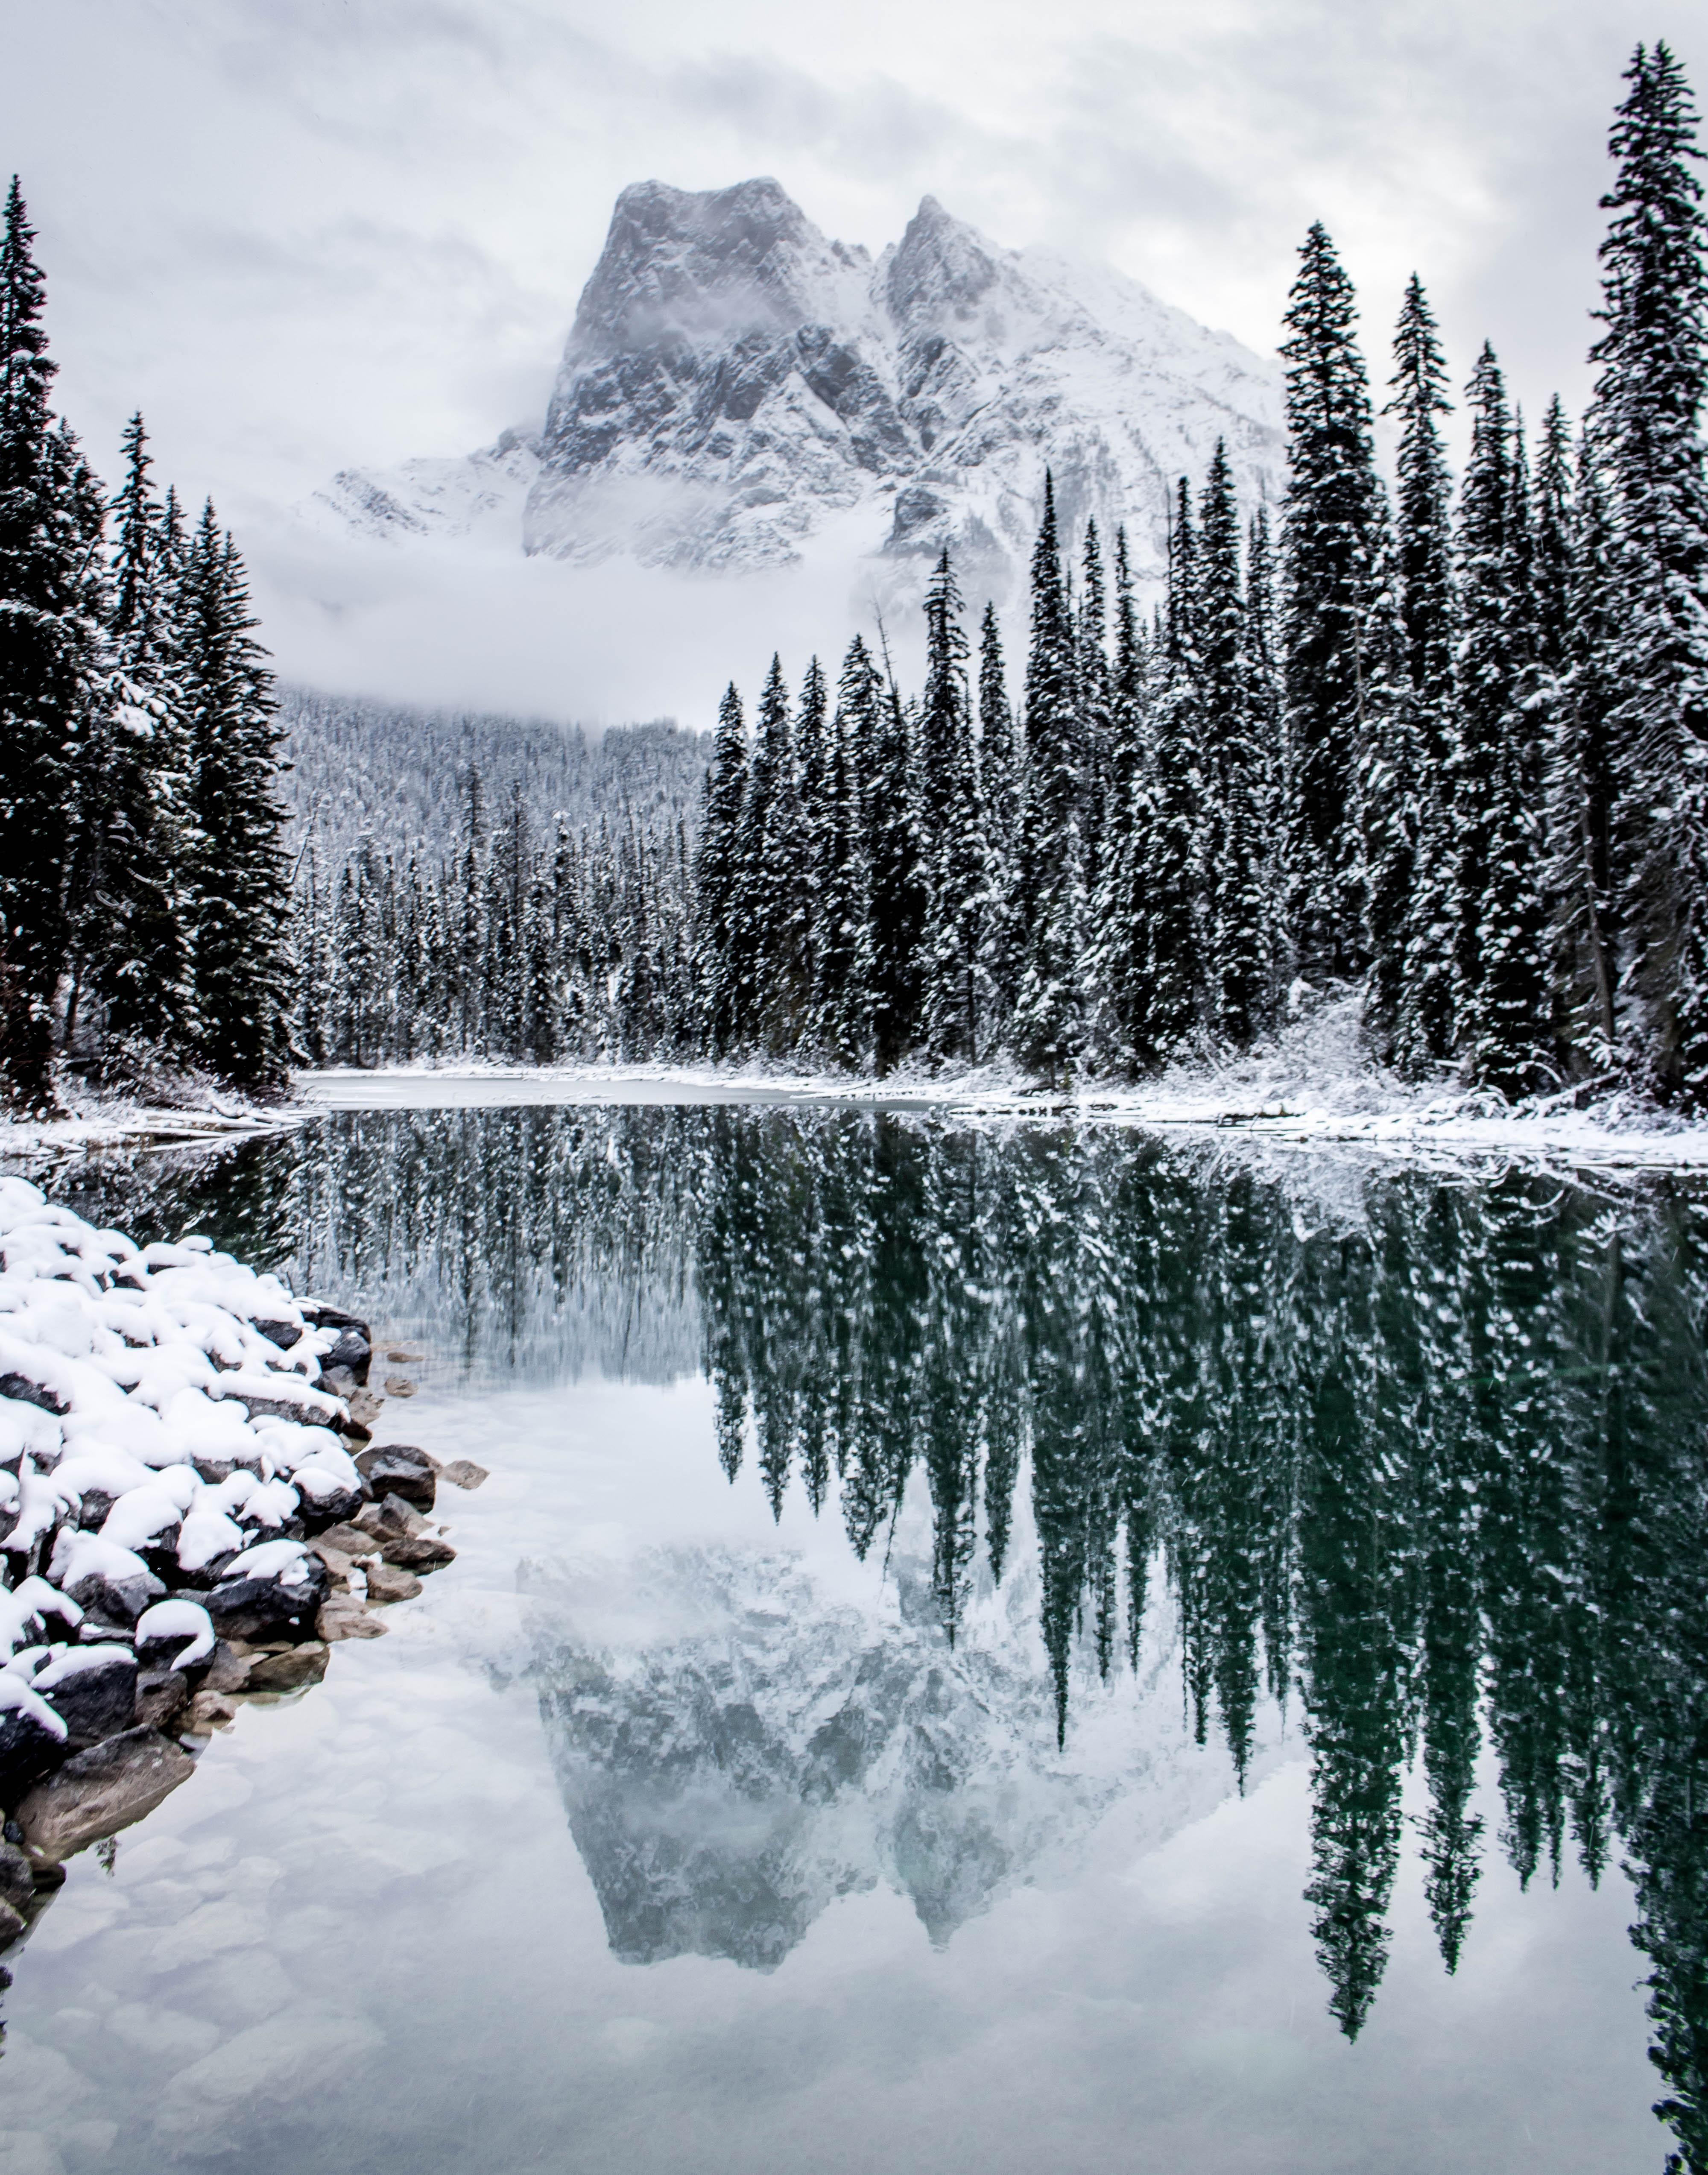 Inside A Snow Globe Emerald Lake Oc 4000x5093 Https Ift Tt 2ycvwxo Winter Scenery Winter Landscape Winter Nature